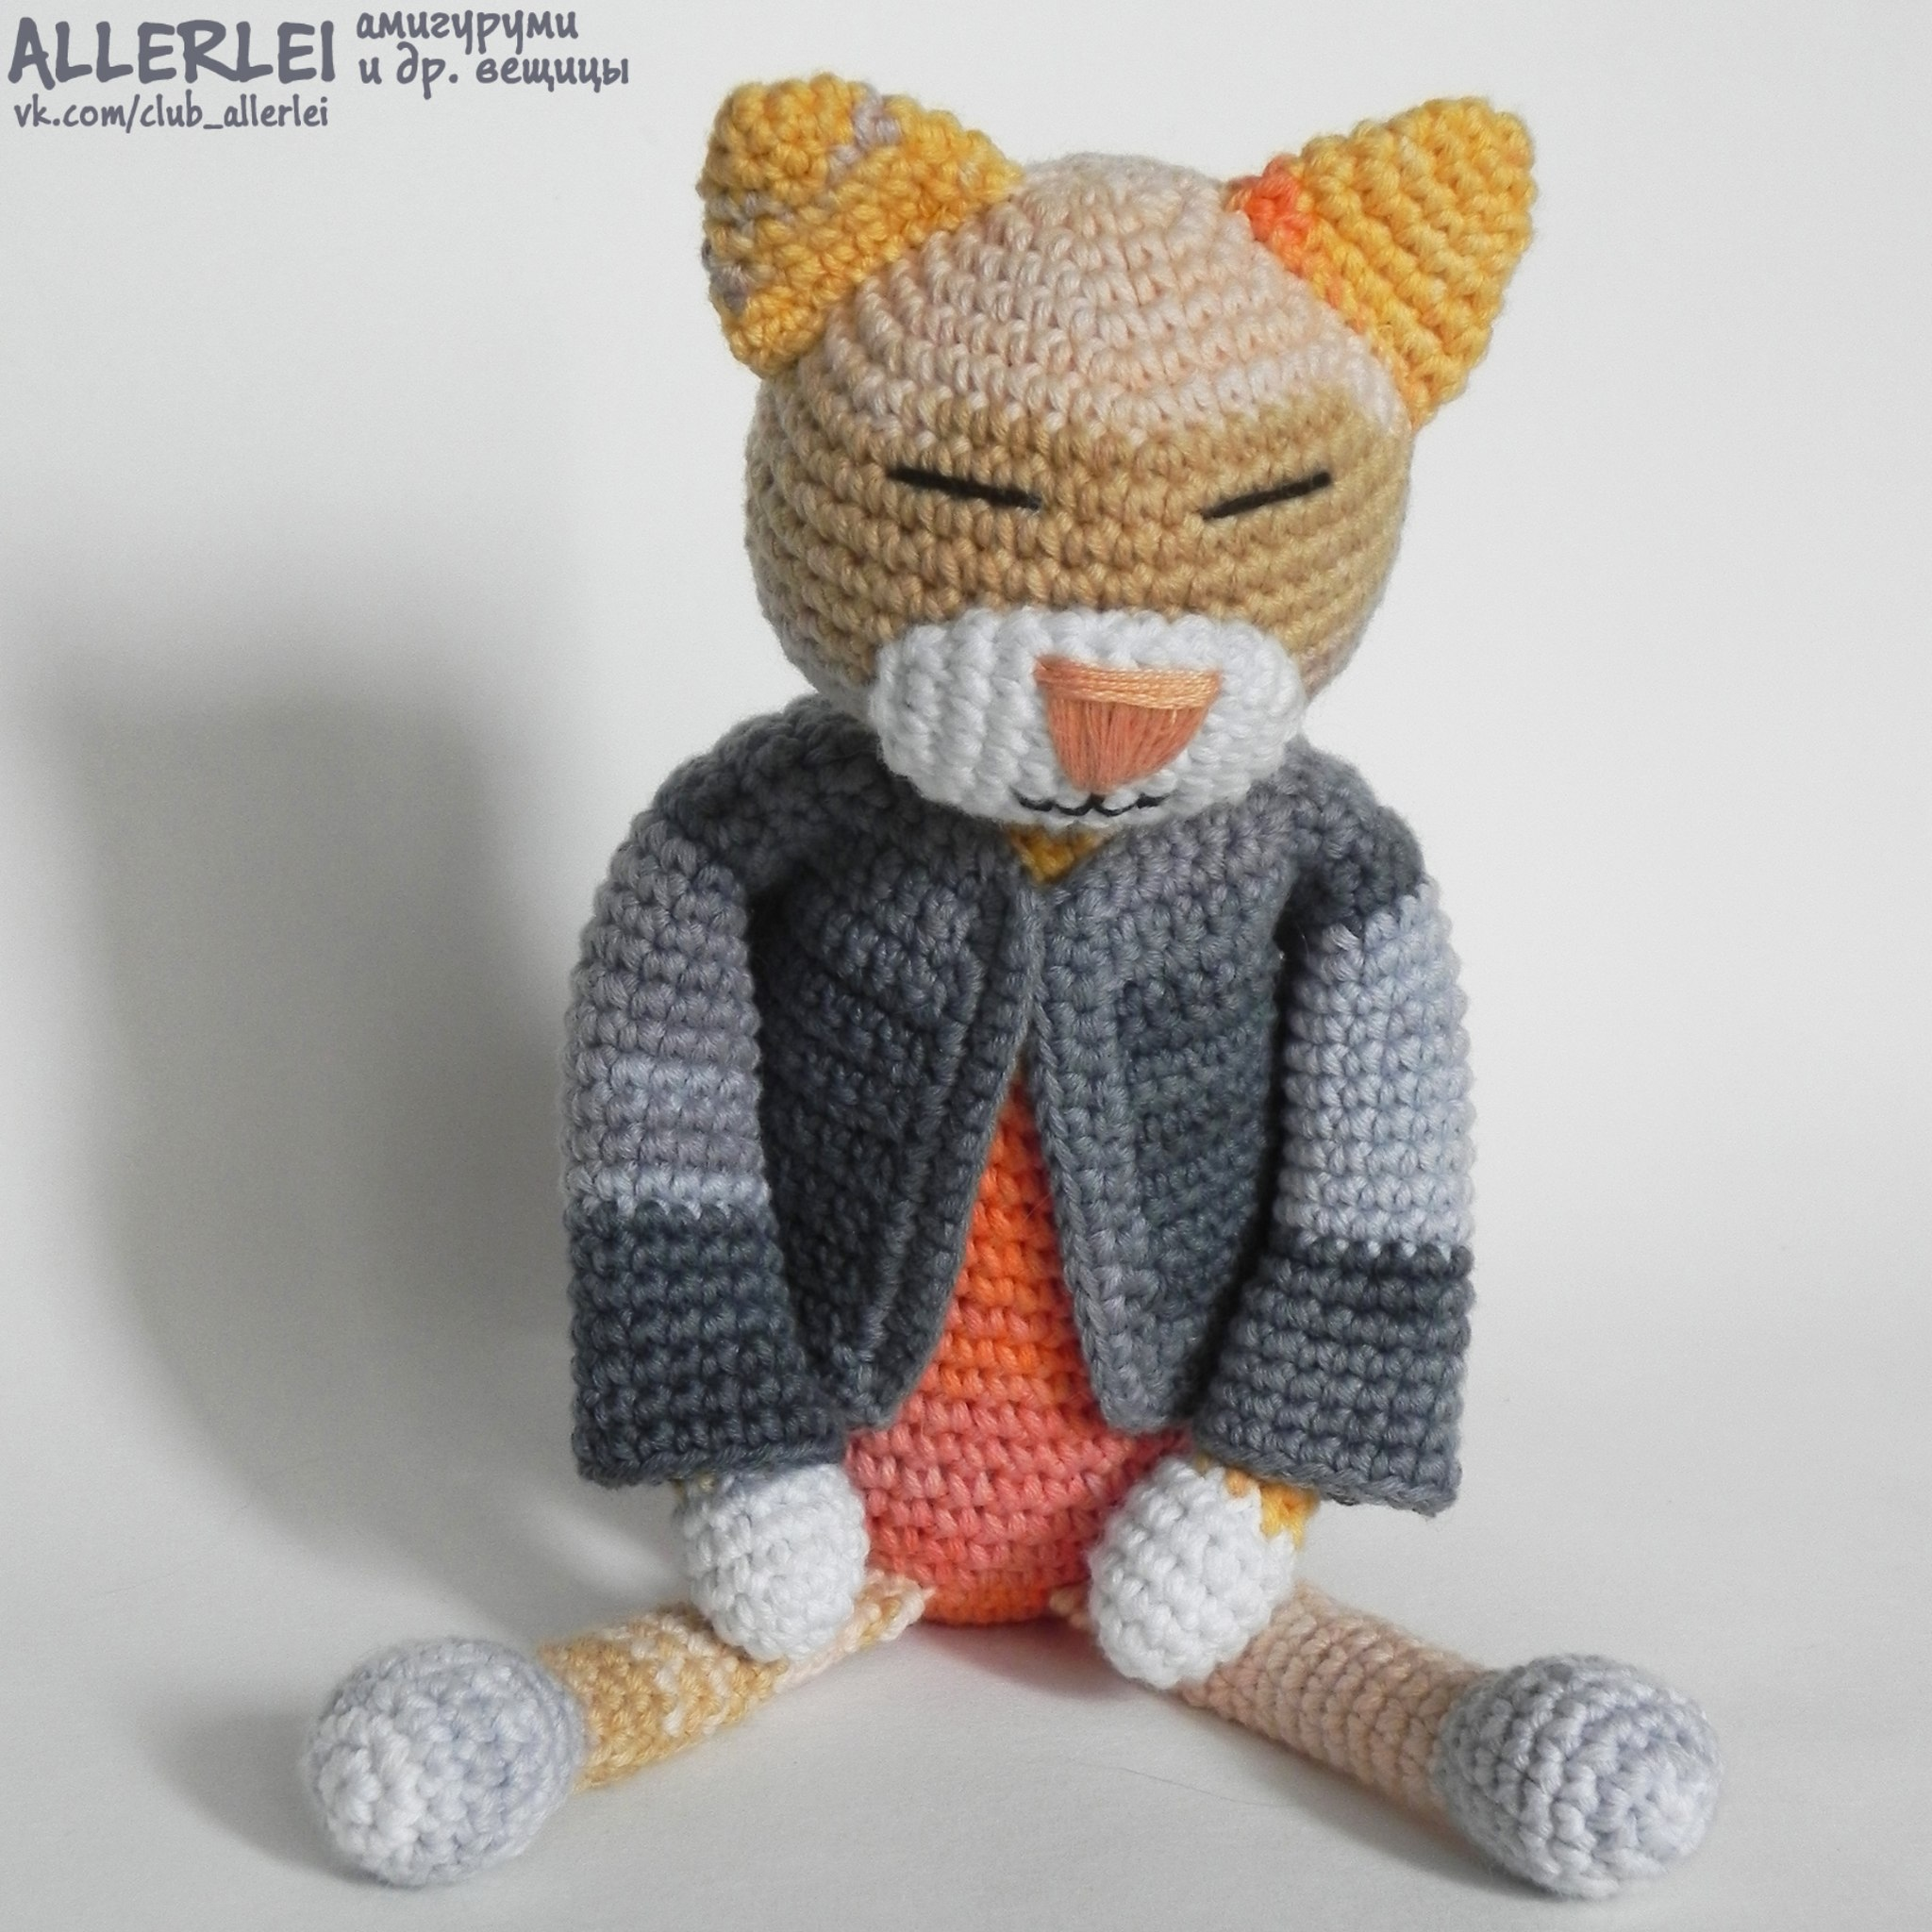 Amigurumi Cat Amineko : 1000+ images about amineko beauties on Pinterest Crochet ...